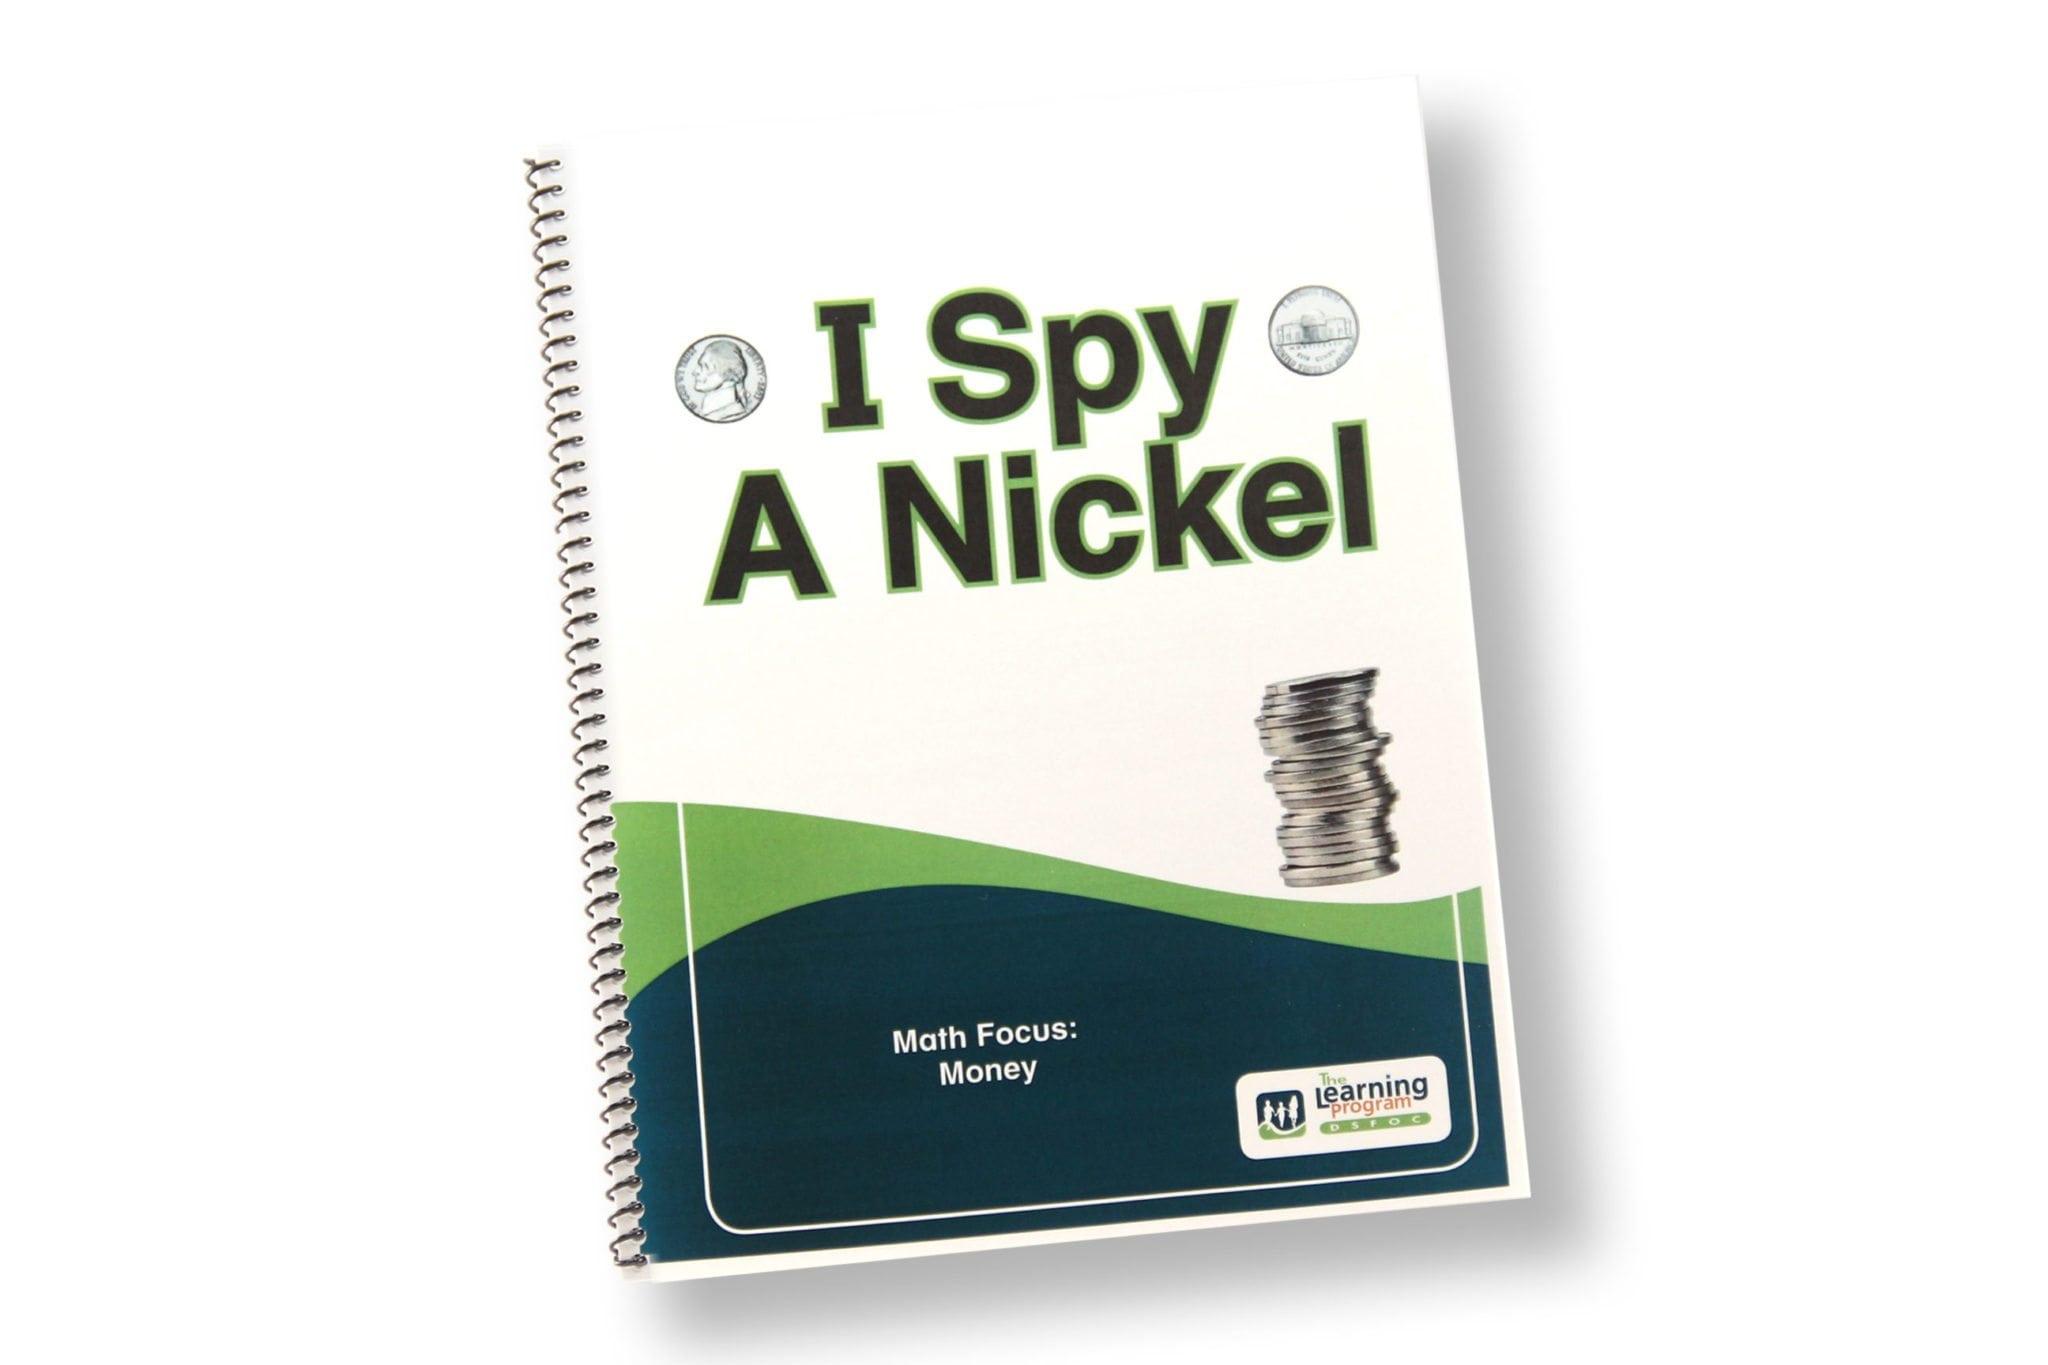 I Spy A Nickel Down Syndrome Foundation Of Orange County